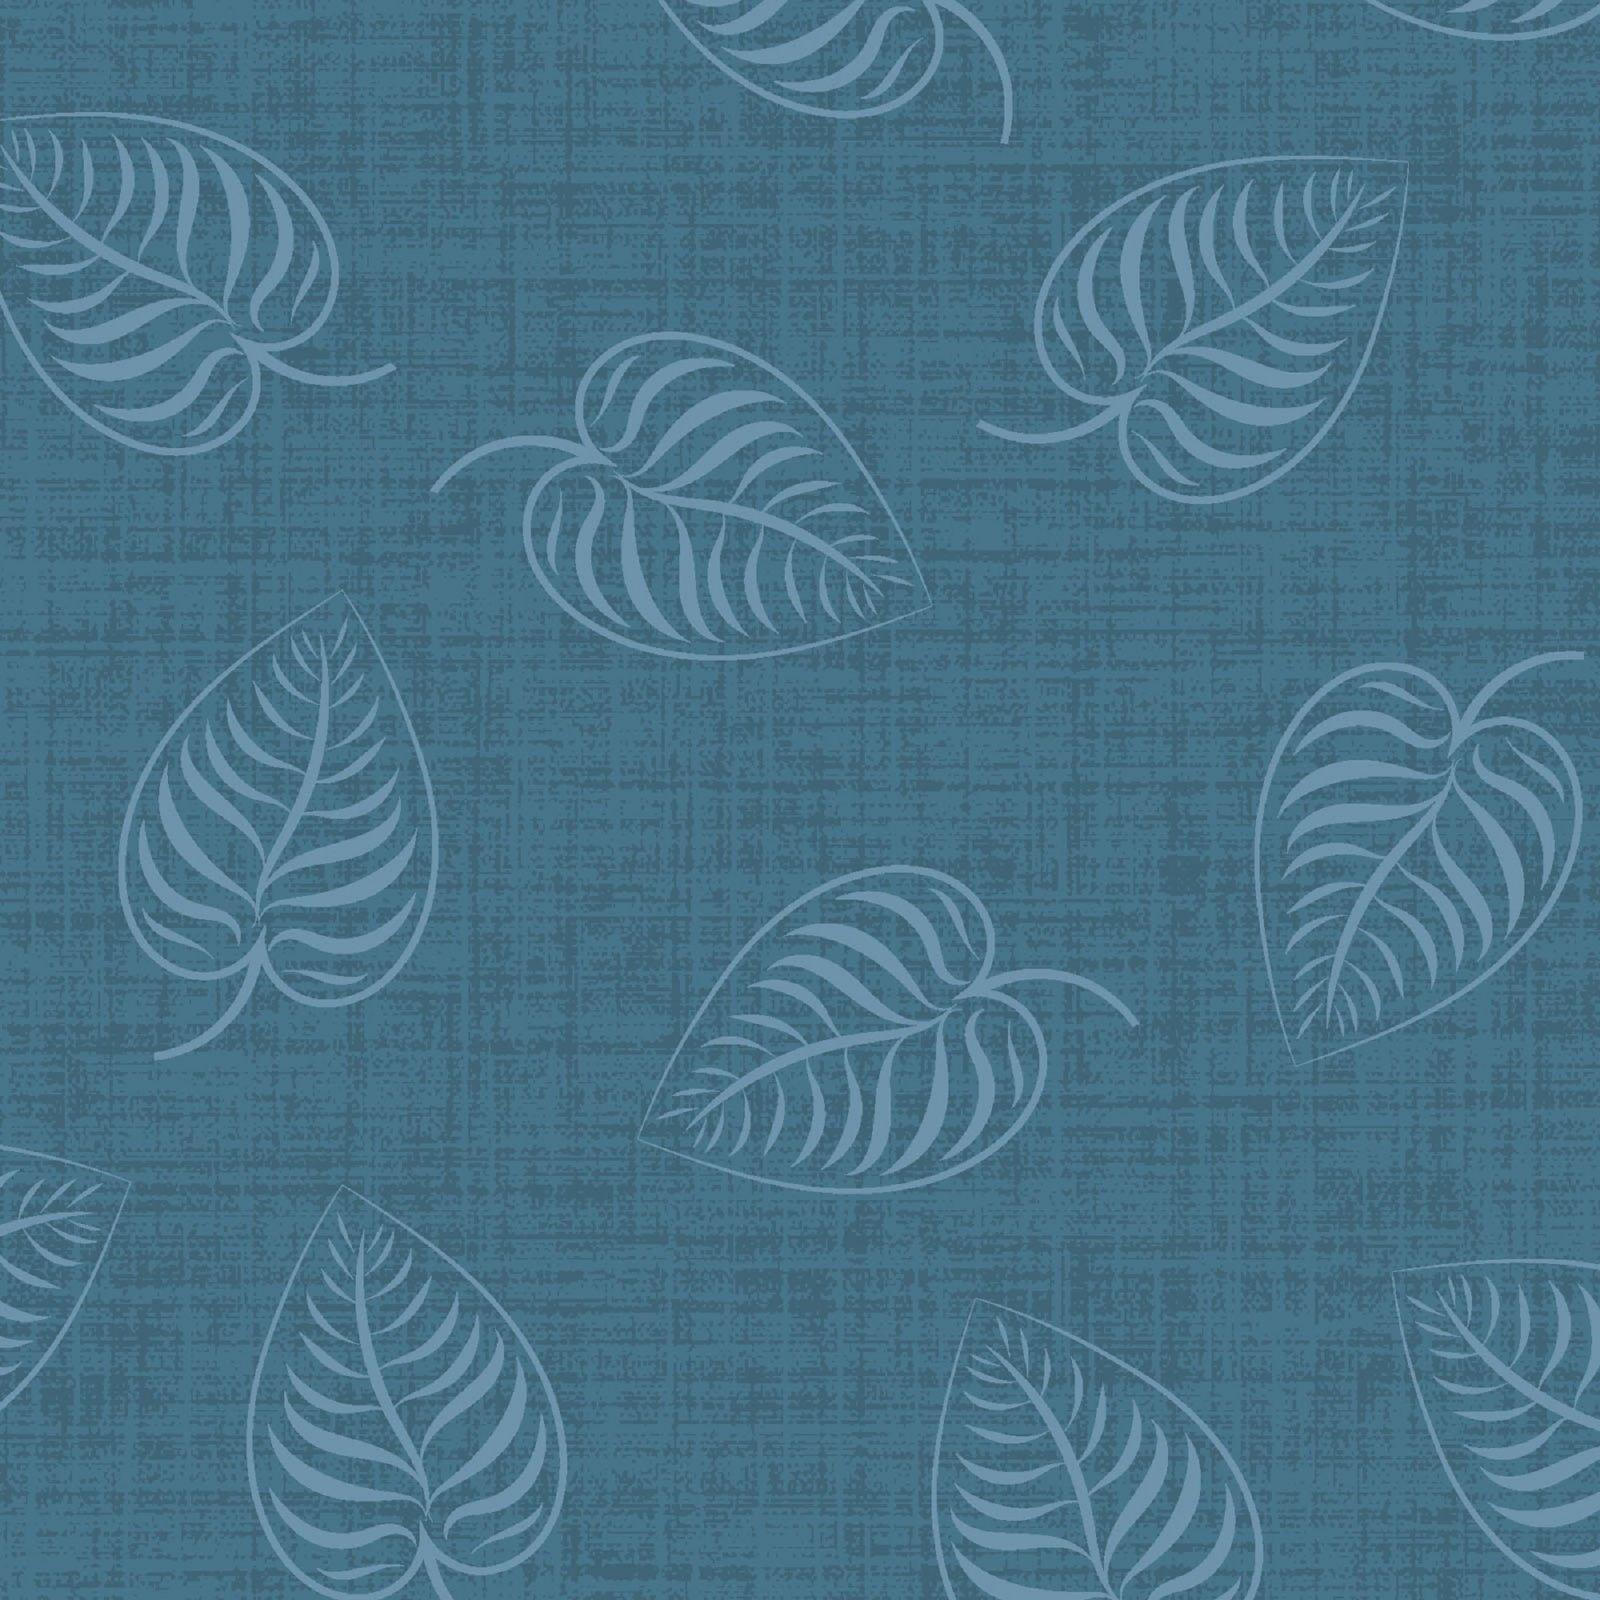 Flower & Vine - Leaf Print - Blue